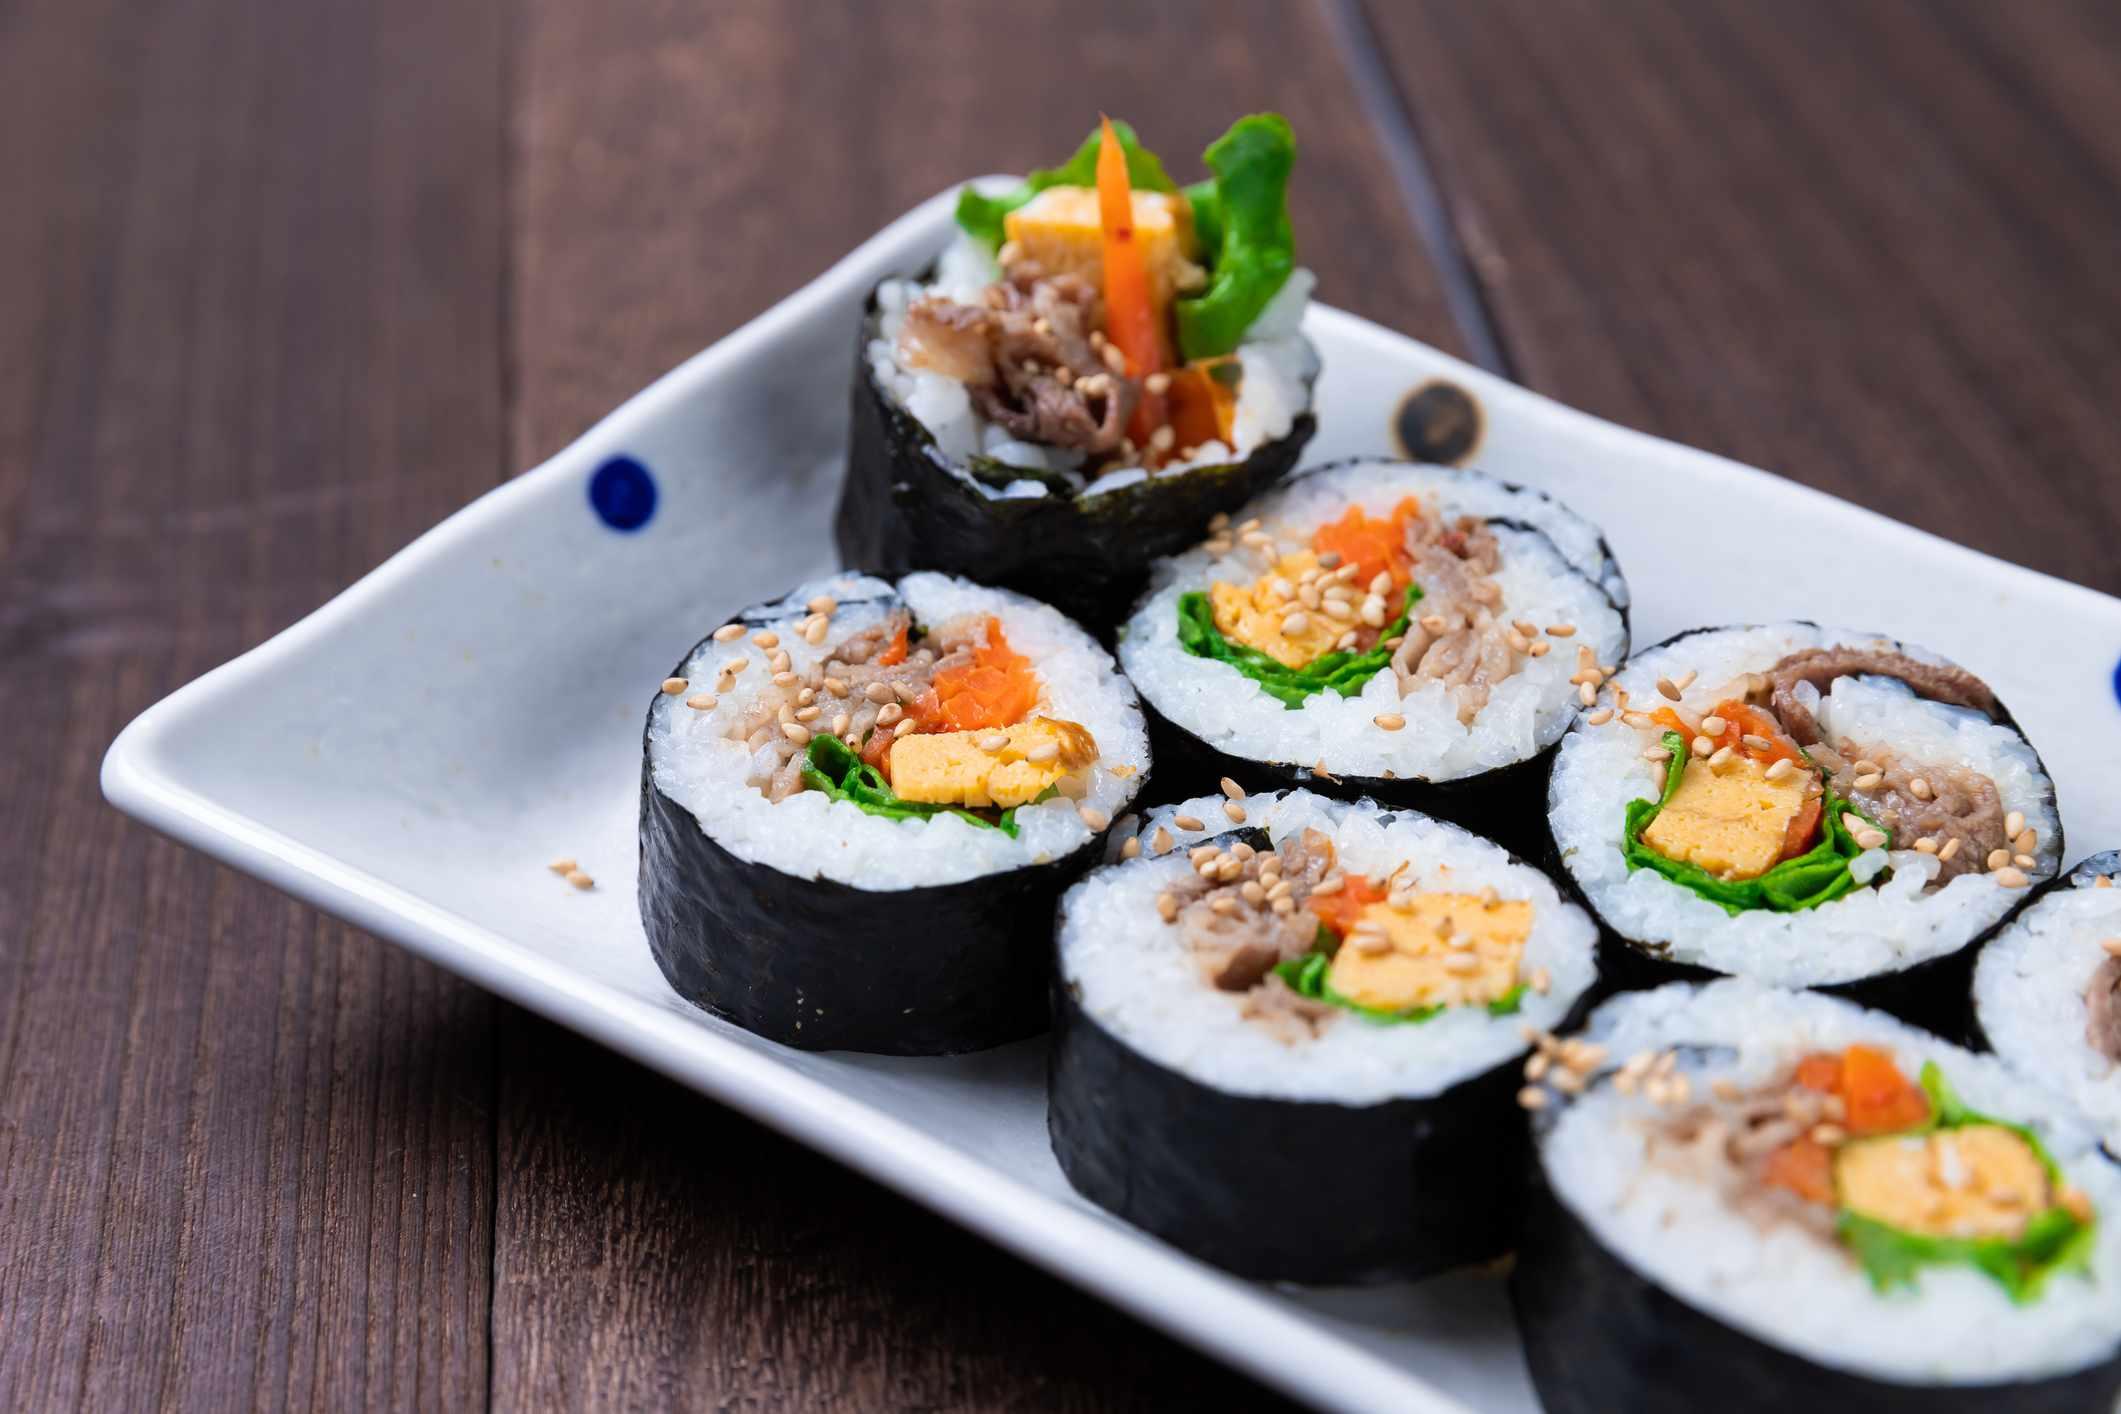 Korean style sushi called kimbap